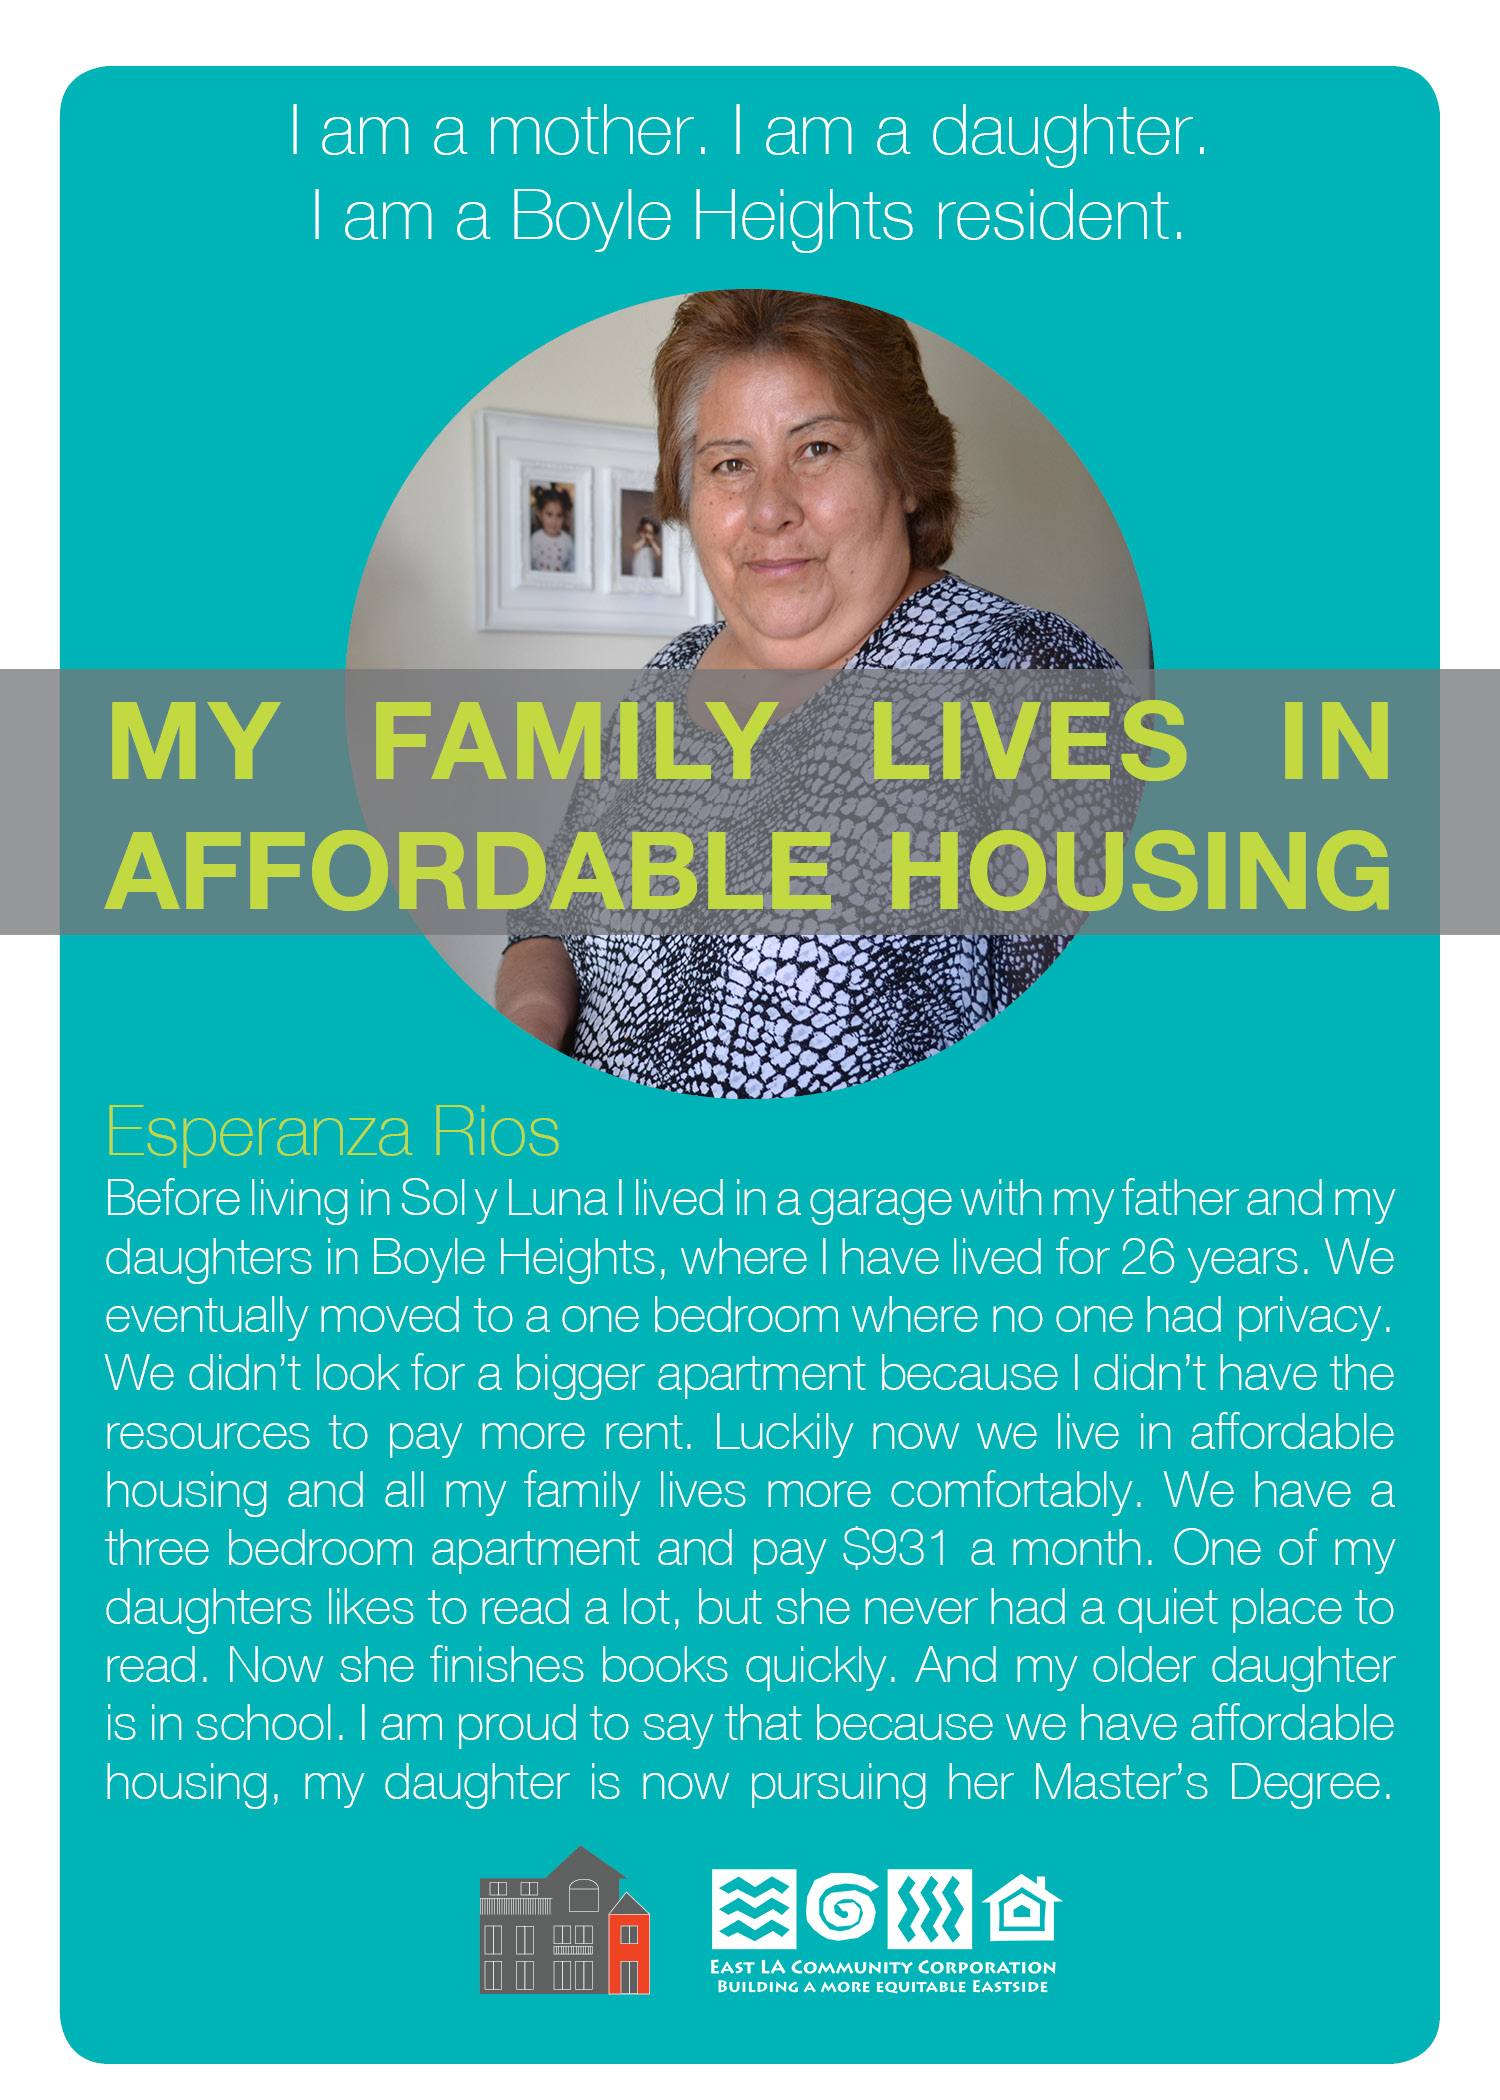 1_-_Live_in_Affordable_Housing-Esperanza-_JPEG.jpg